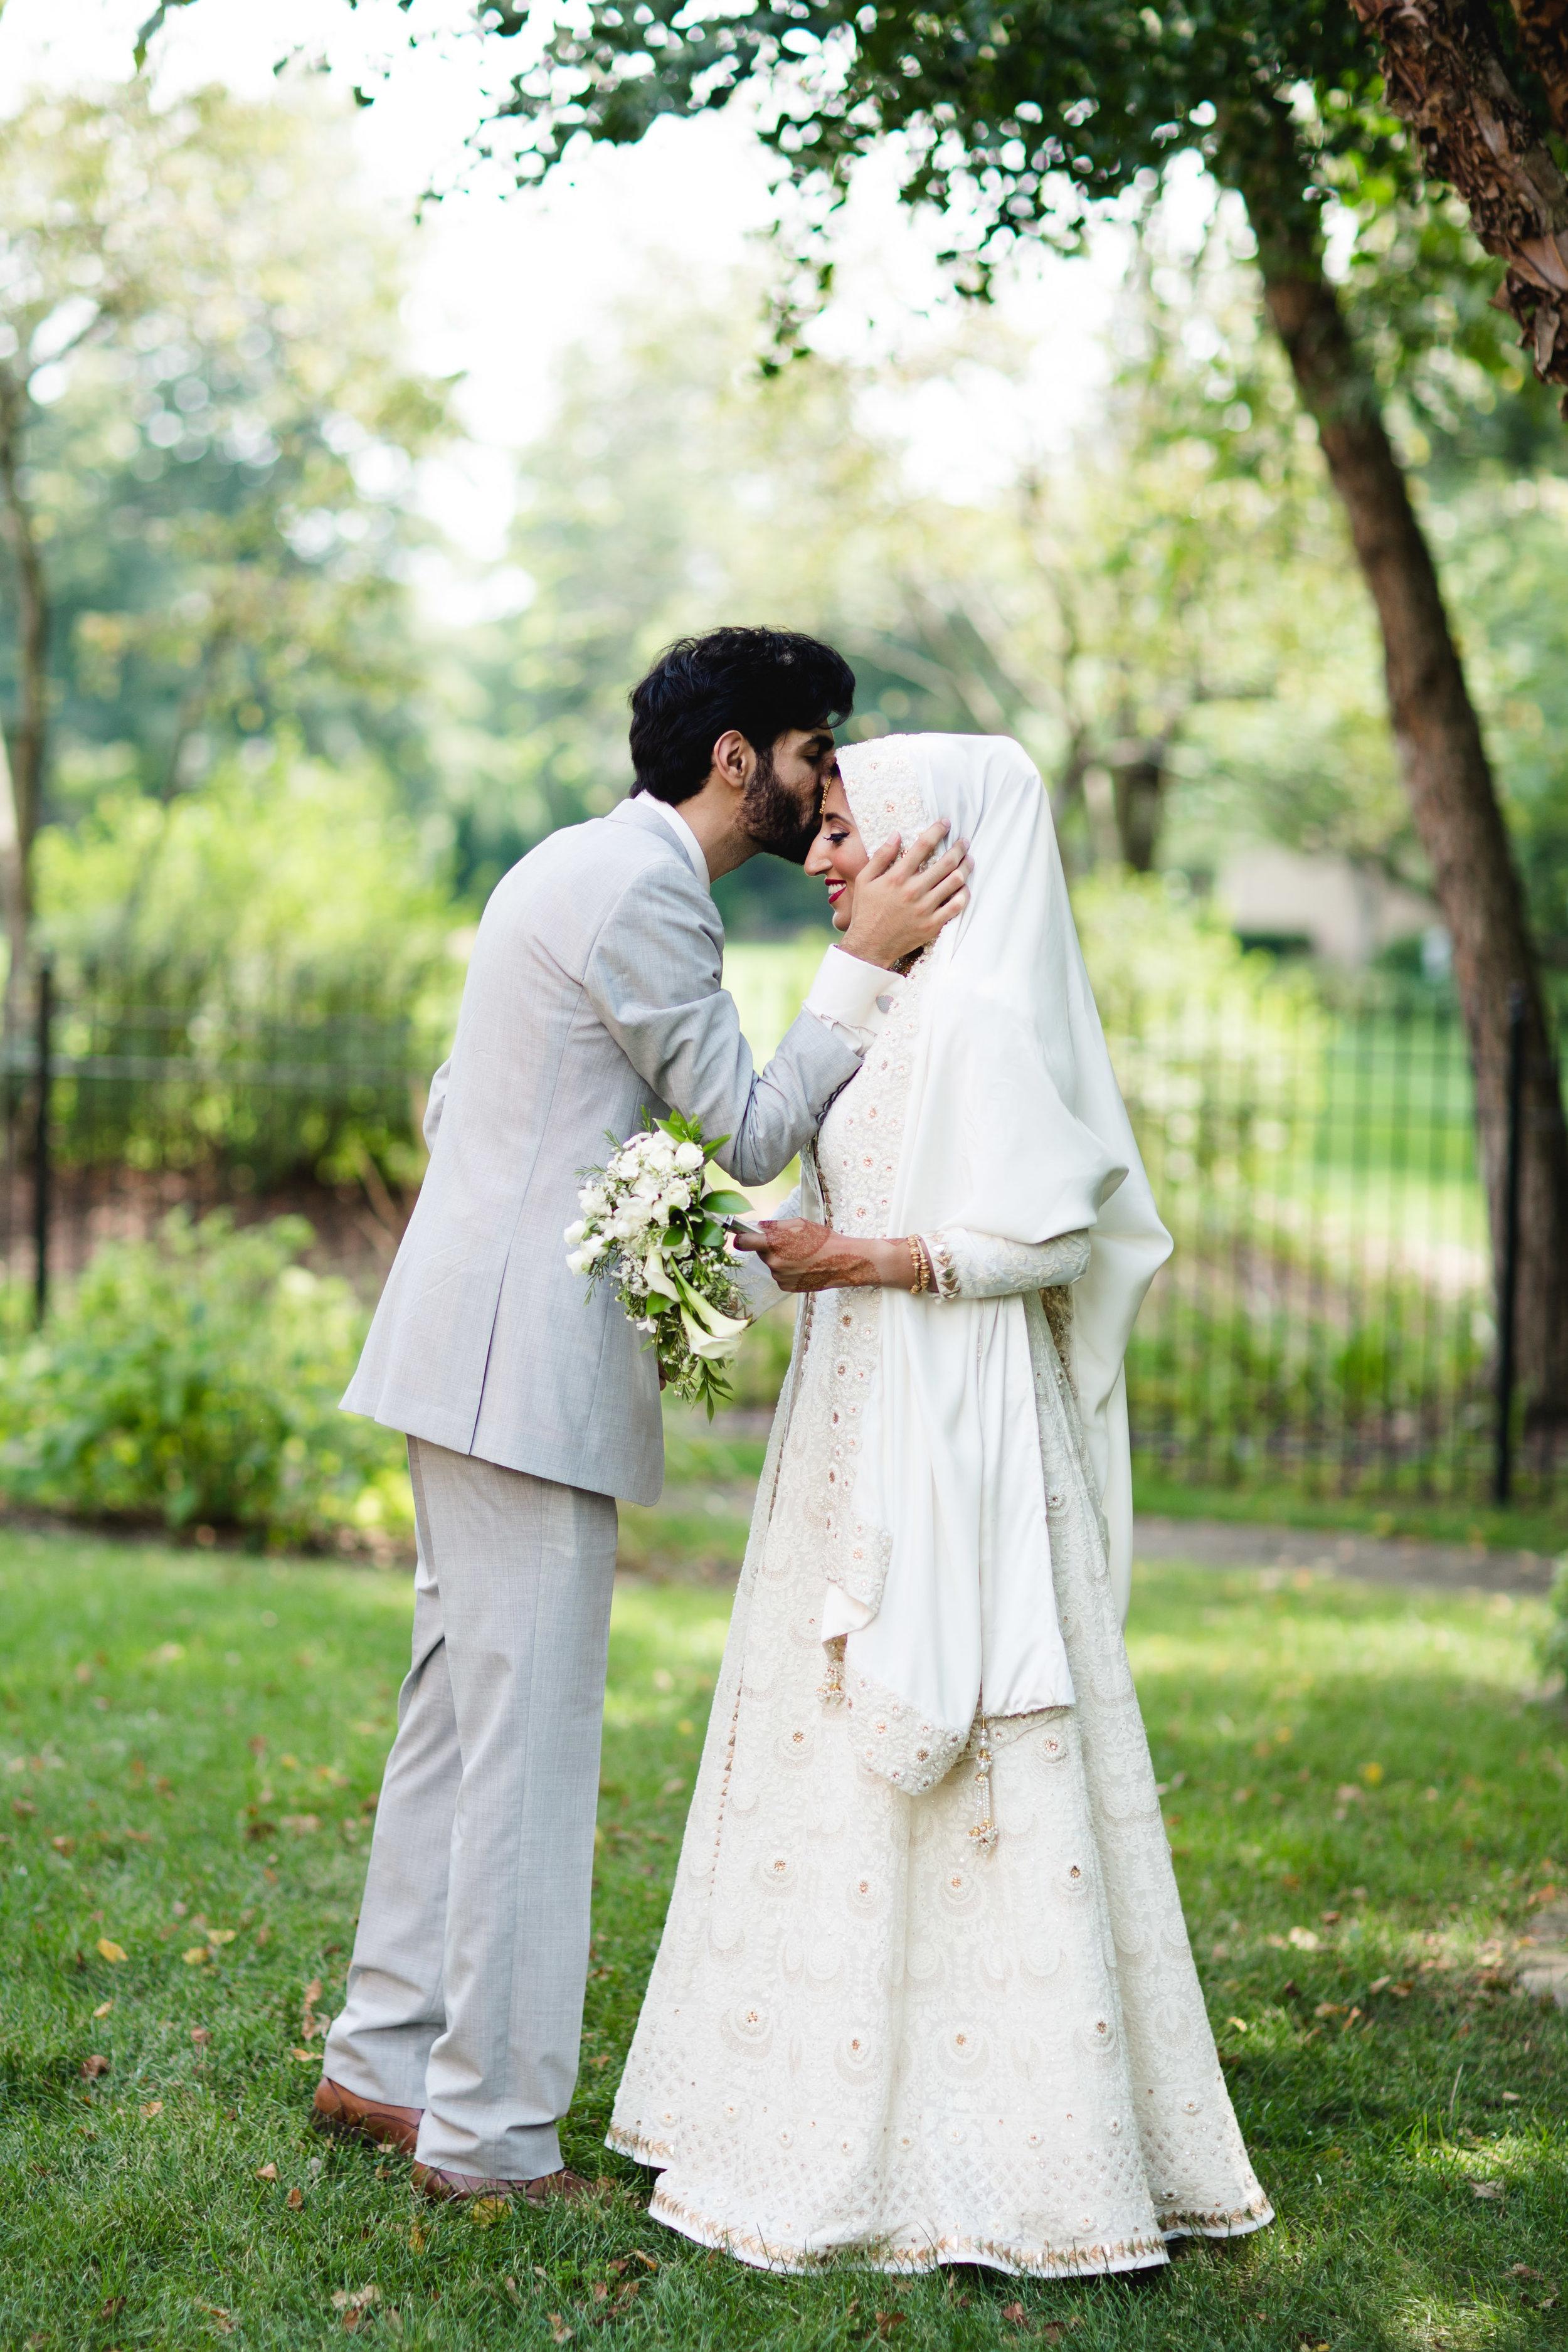 LisaDiederichPhotography_Maryam&Salman-111.jpg